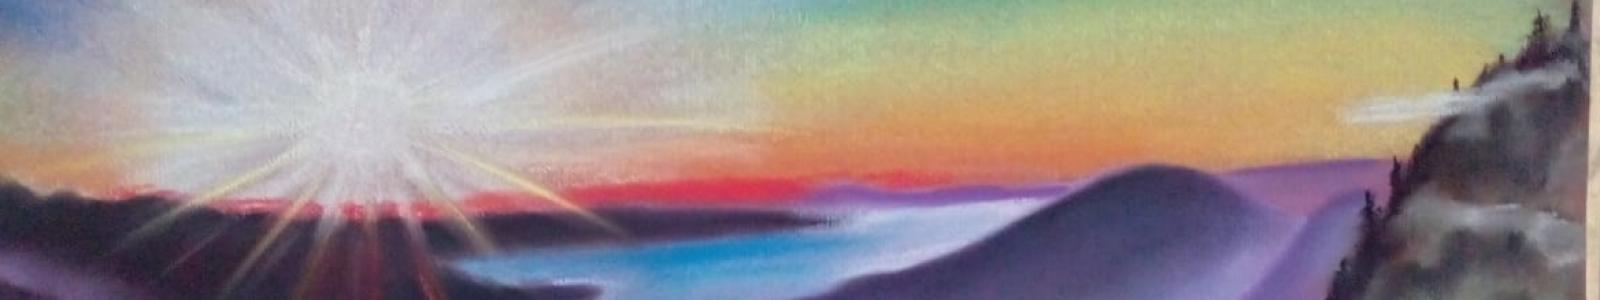 Gallery Painter Svetlana Samarina